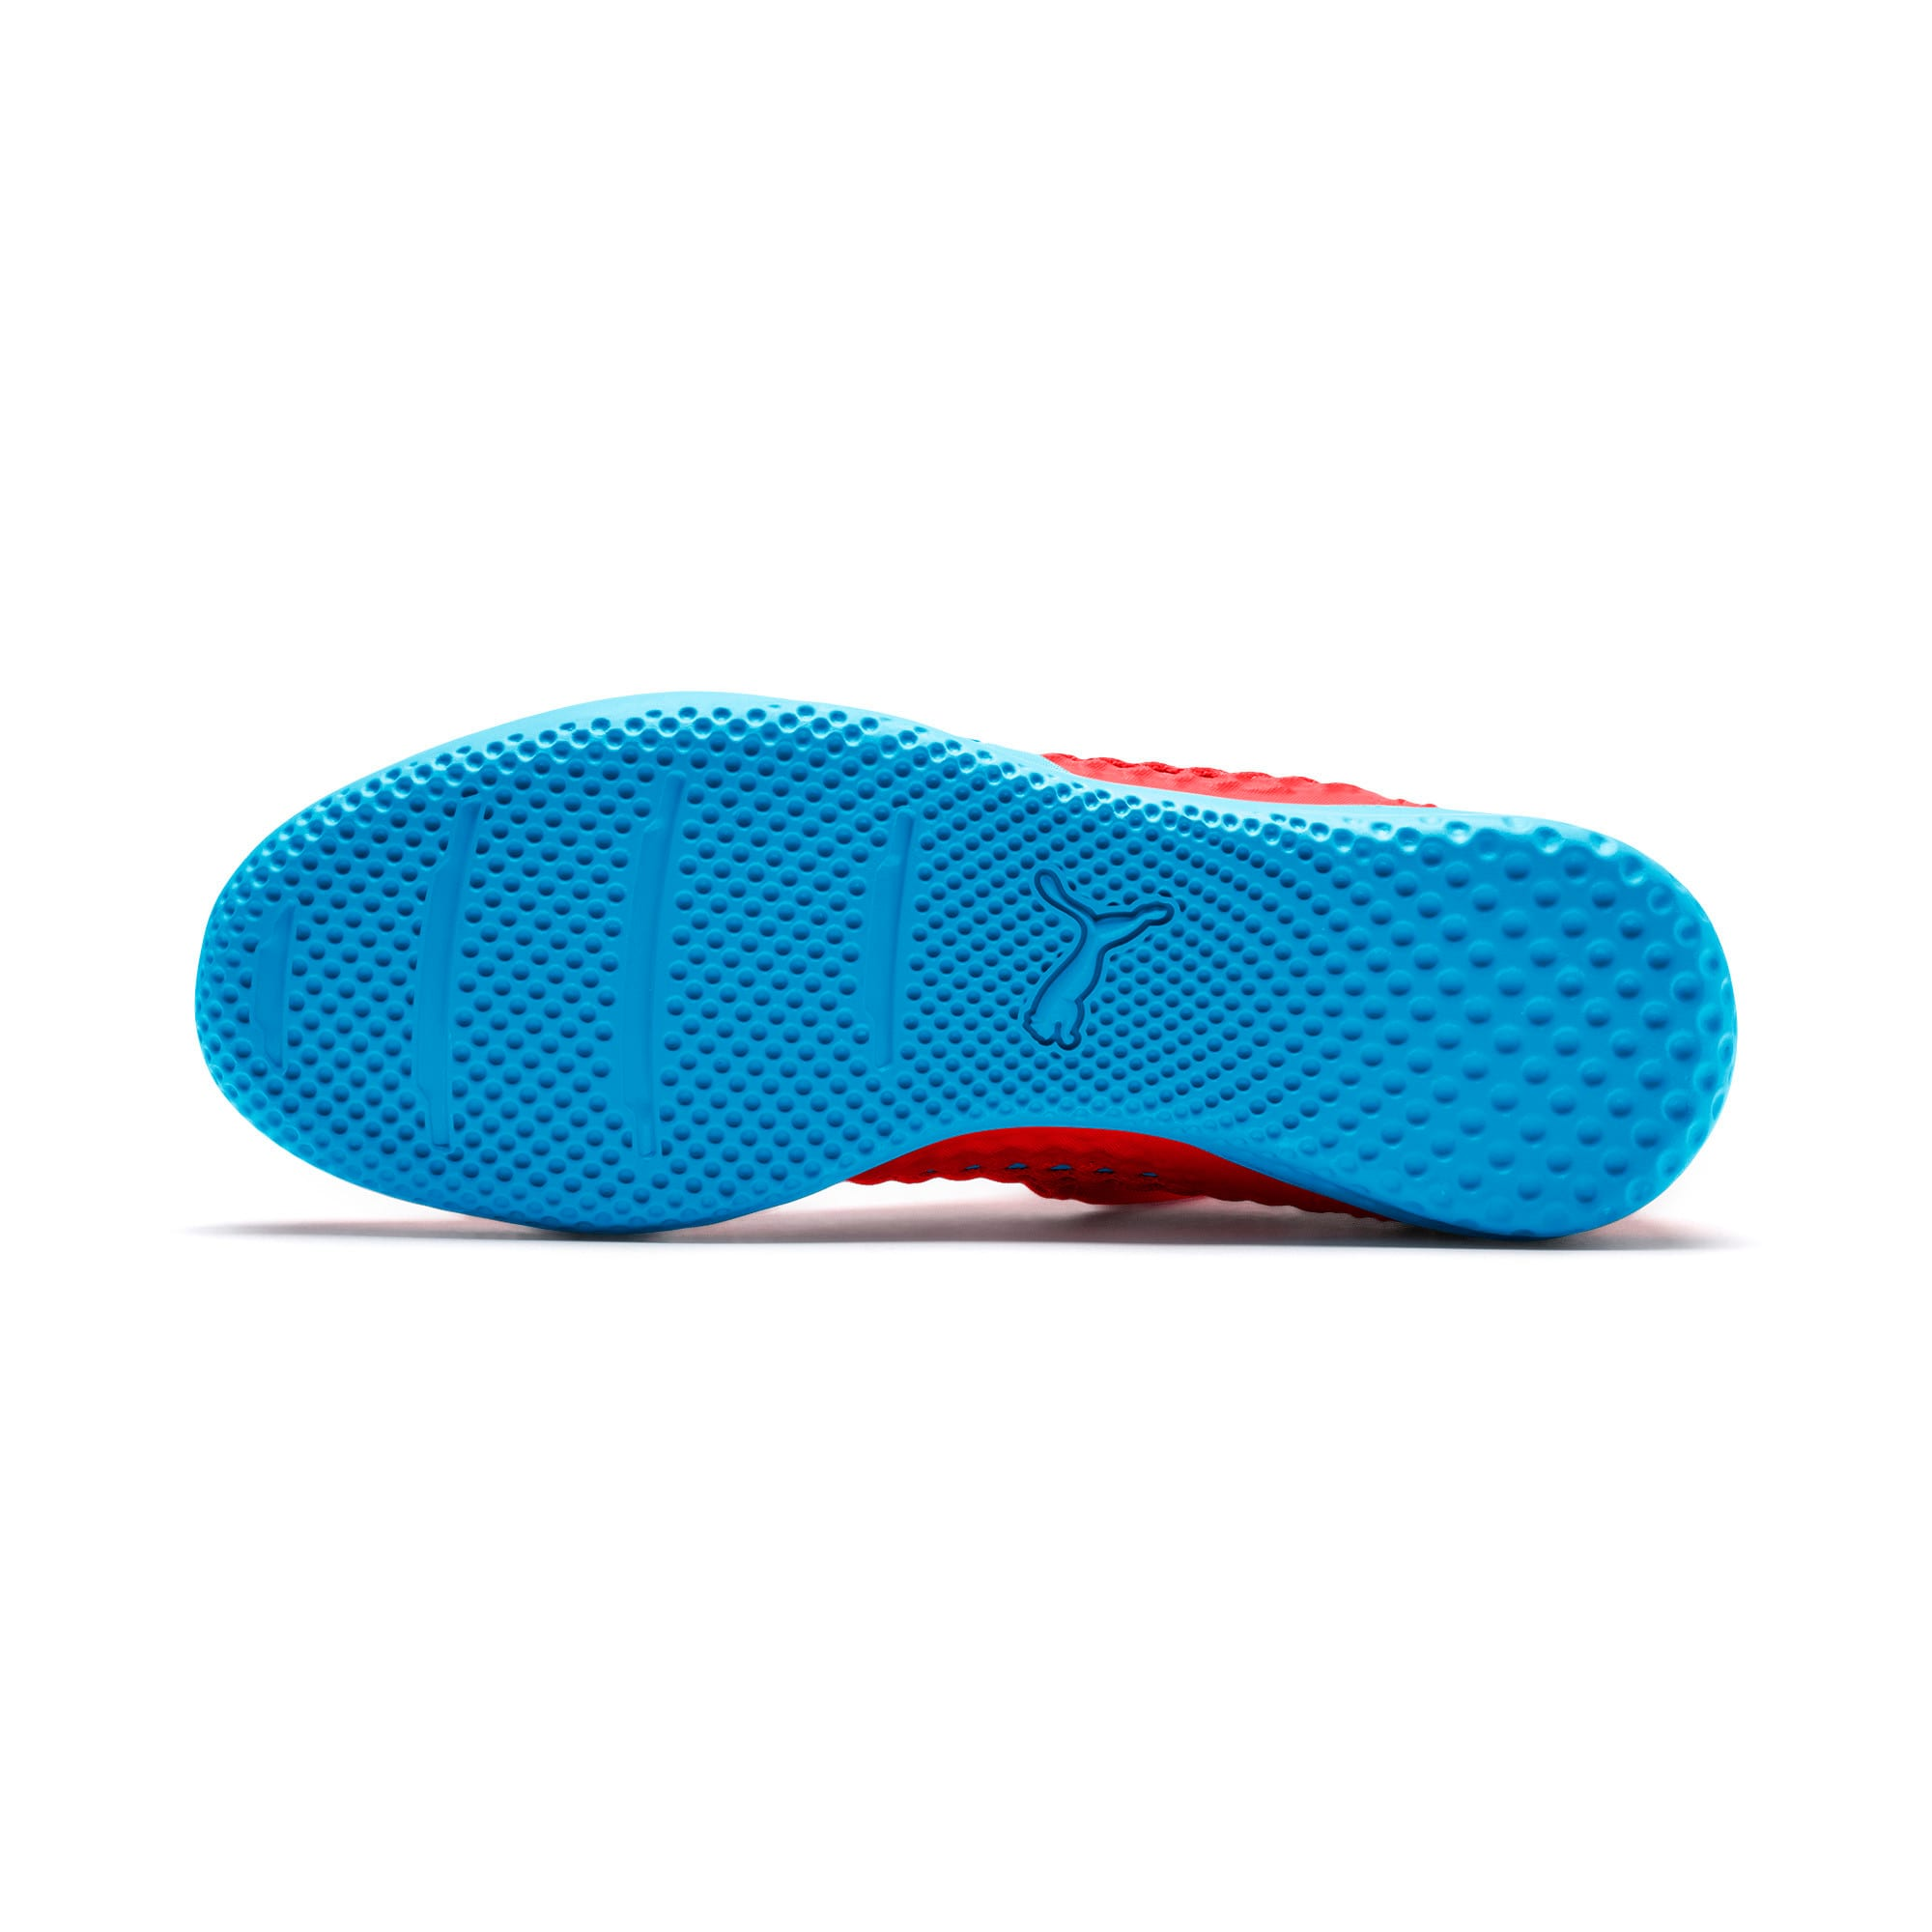 Thumbnail 3 of FUTURE 19.3 NETFIT IT Men's Soccer Shoes, Red Blast-Bleu Azur, medium